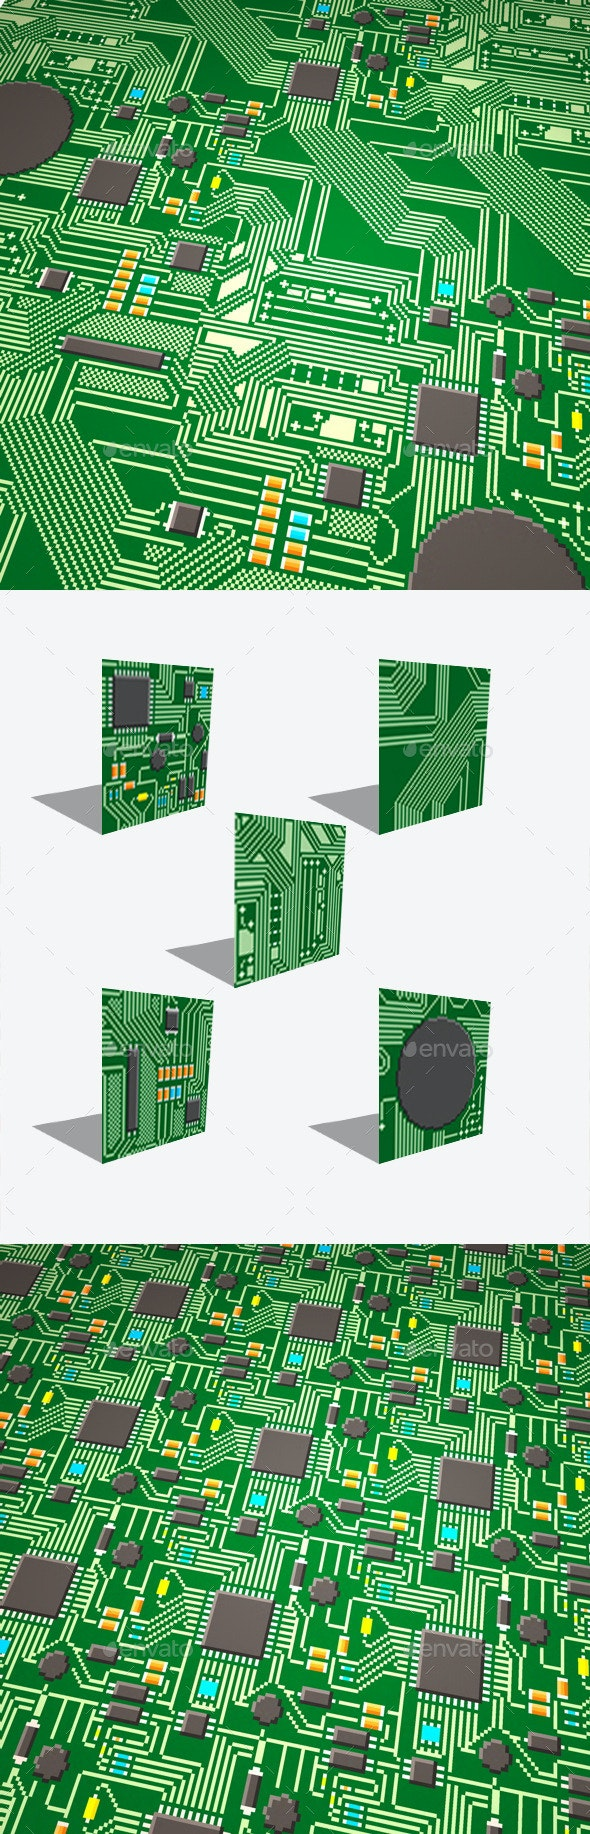 5 Circuit Board Pixel Seamless Modular Textures - Tilesets Game Assets